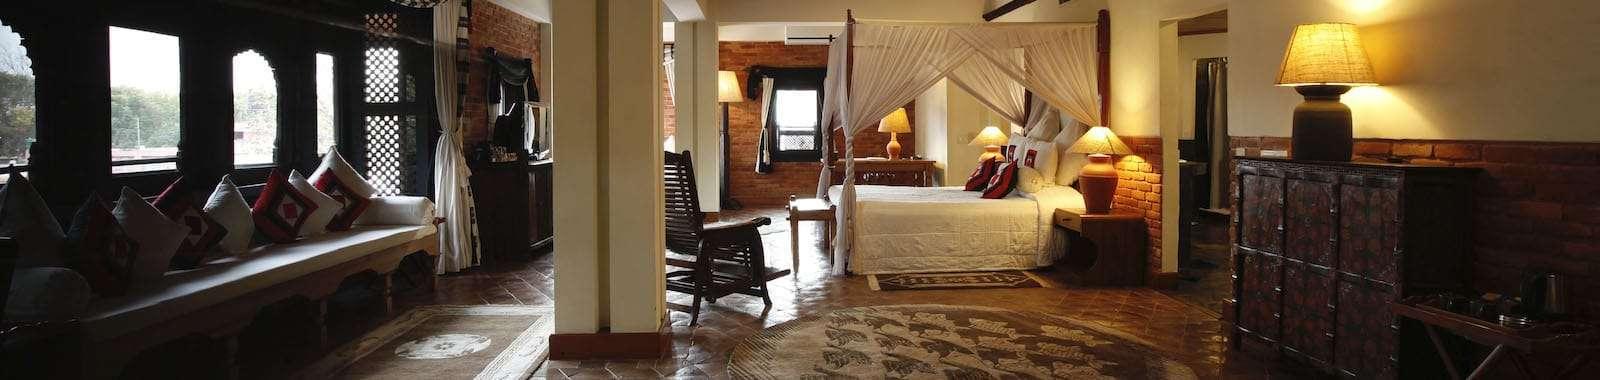 Stay at the luxury boutique hotel Dwarika's in Kathmandu